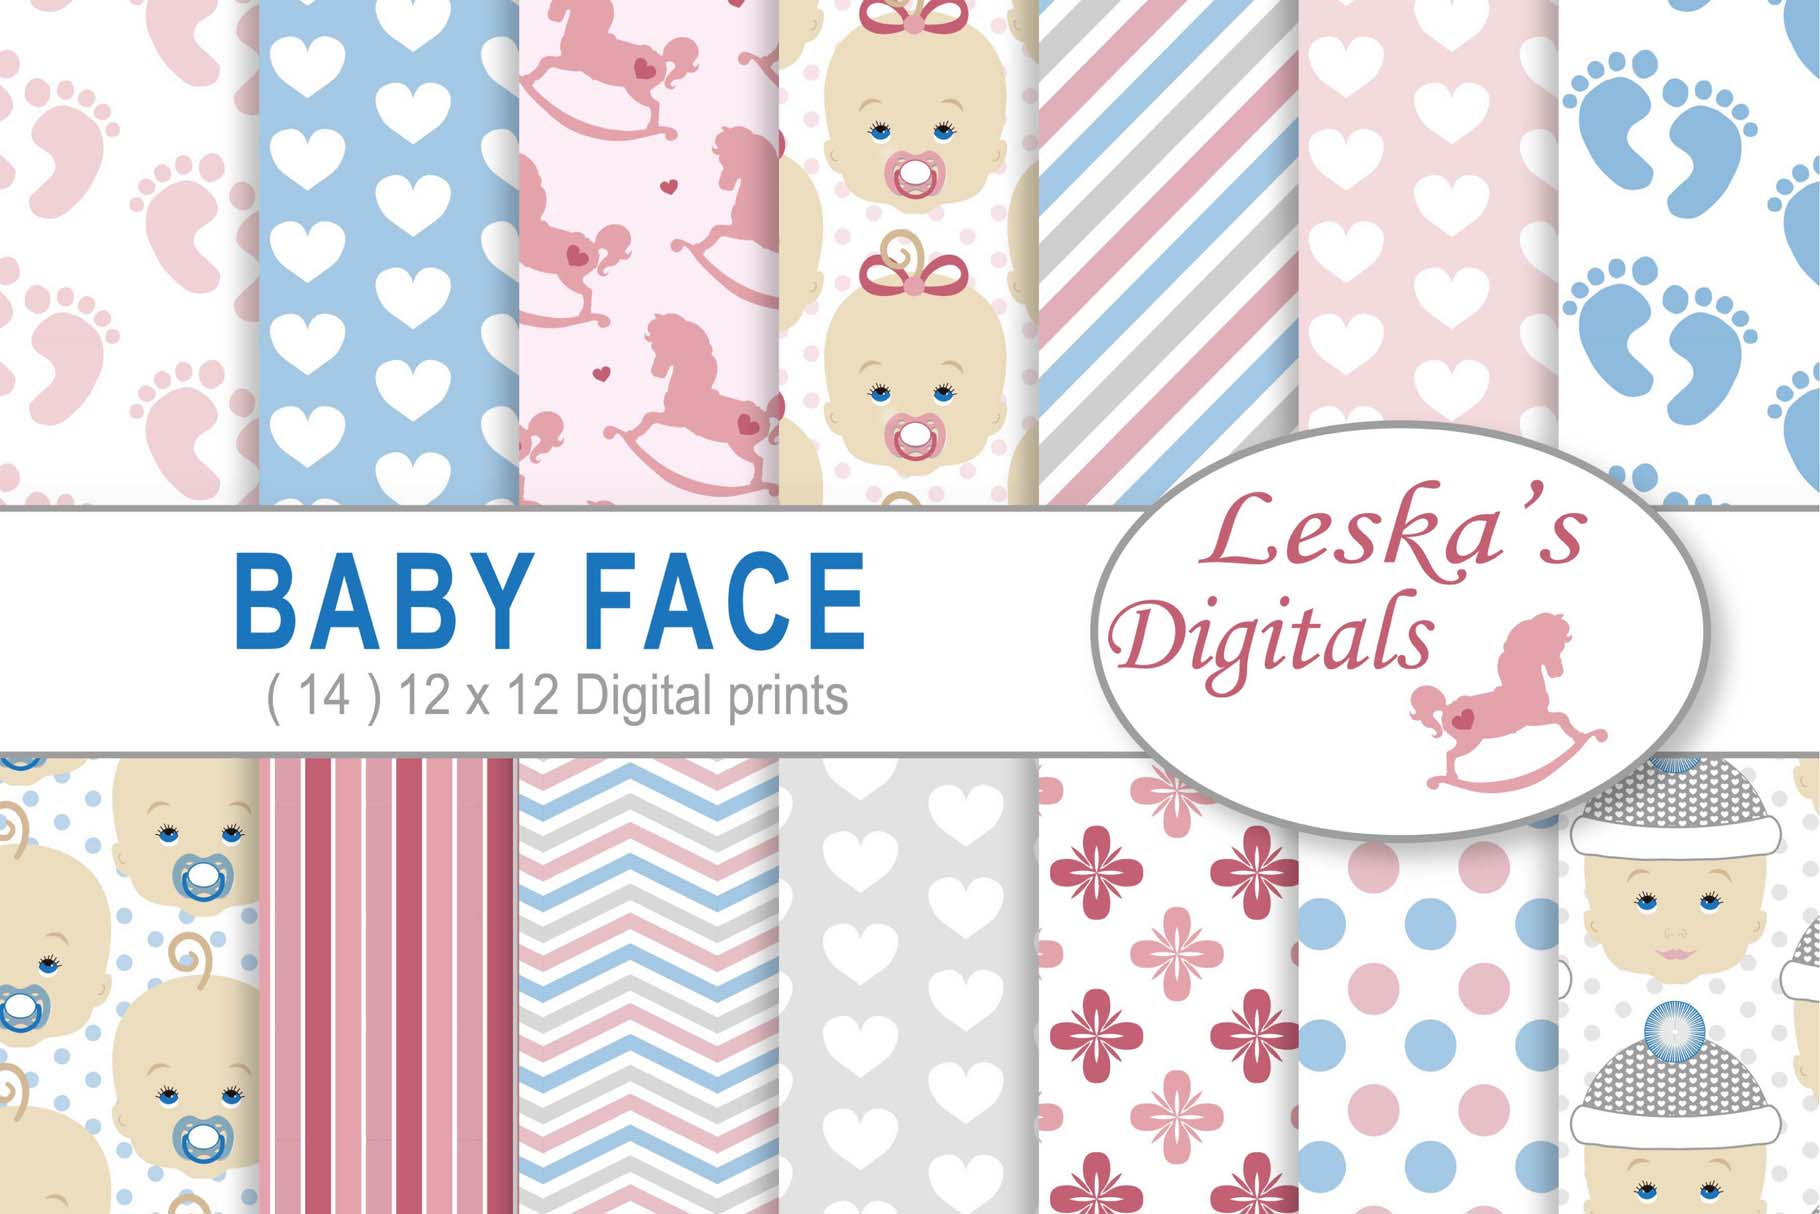 Babyface Baby Scrapbook Paper example image 1